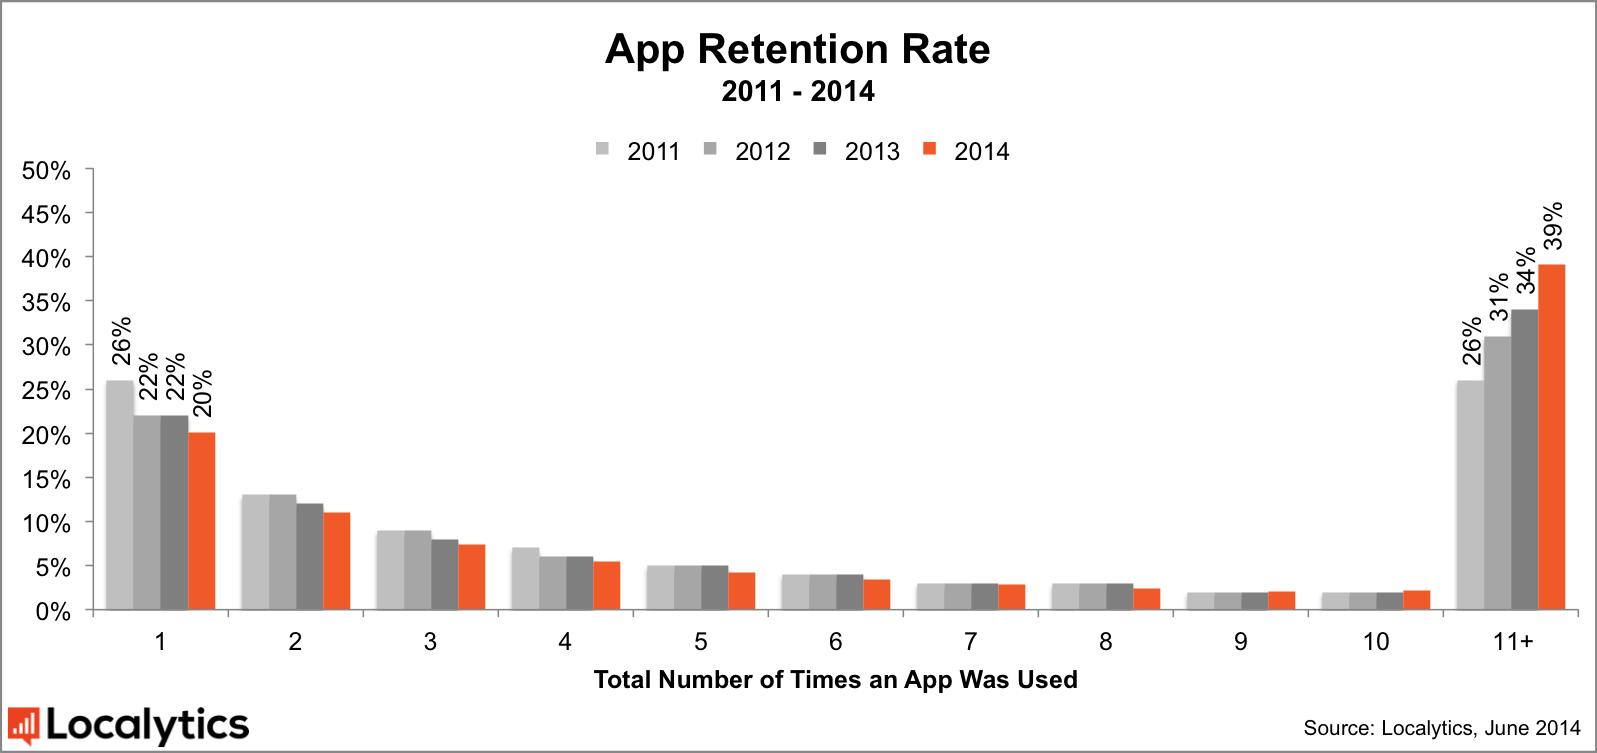 app retention rate 2014